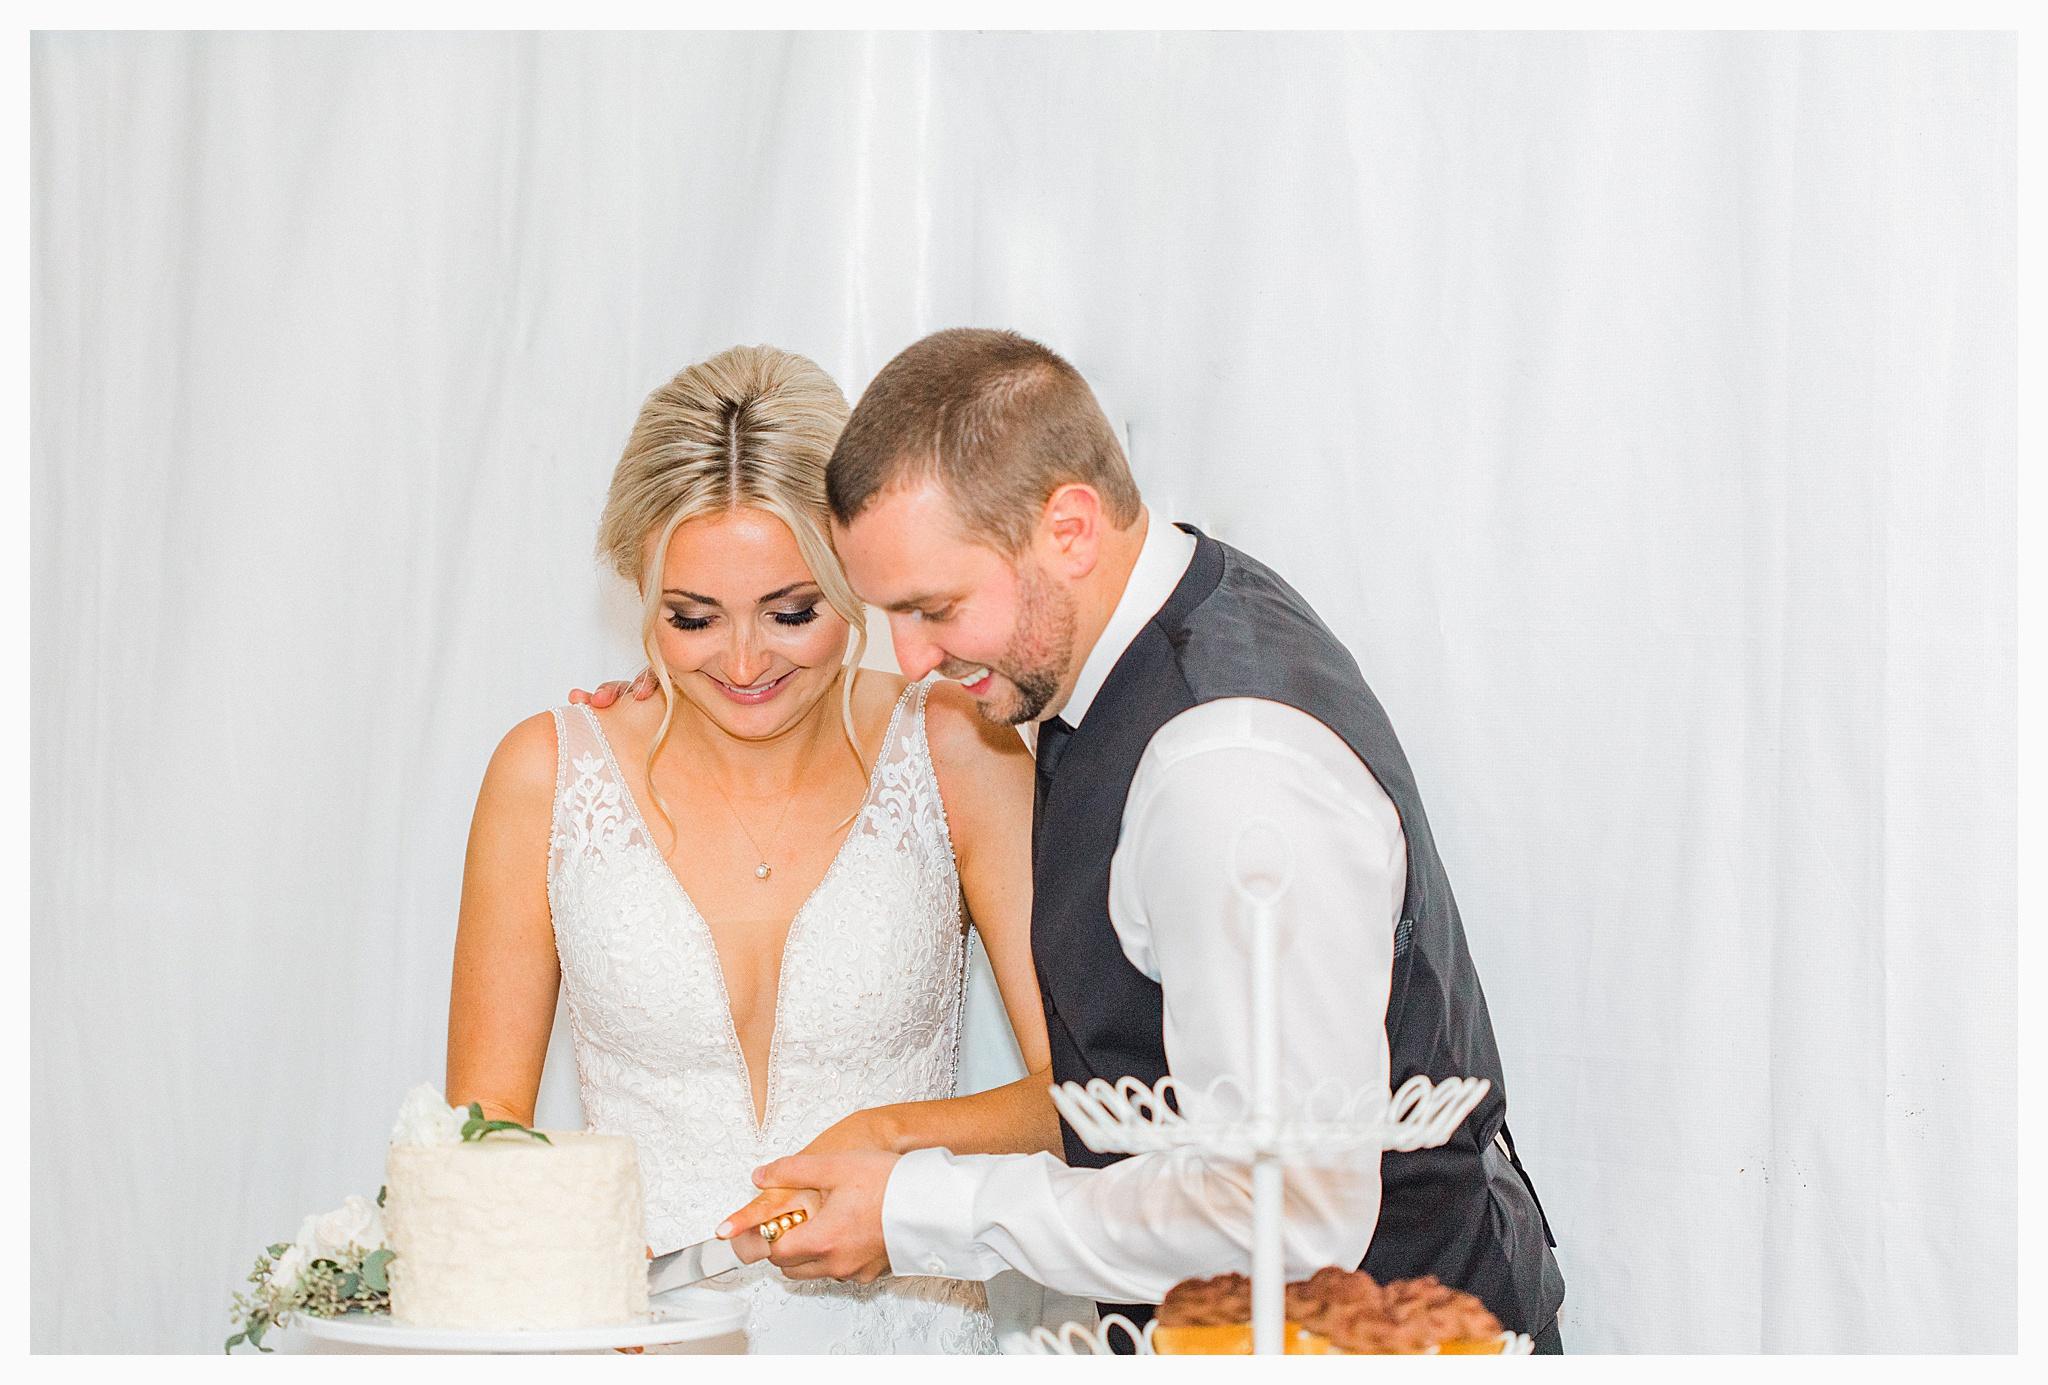 Emma Rose Company Light and Airy Wedding Photographer, Beautiful fall wedding at Rock Creek Gardens Venue in Puyallup, Washington._0103.jpg